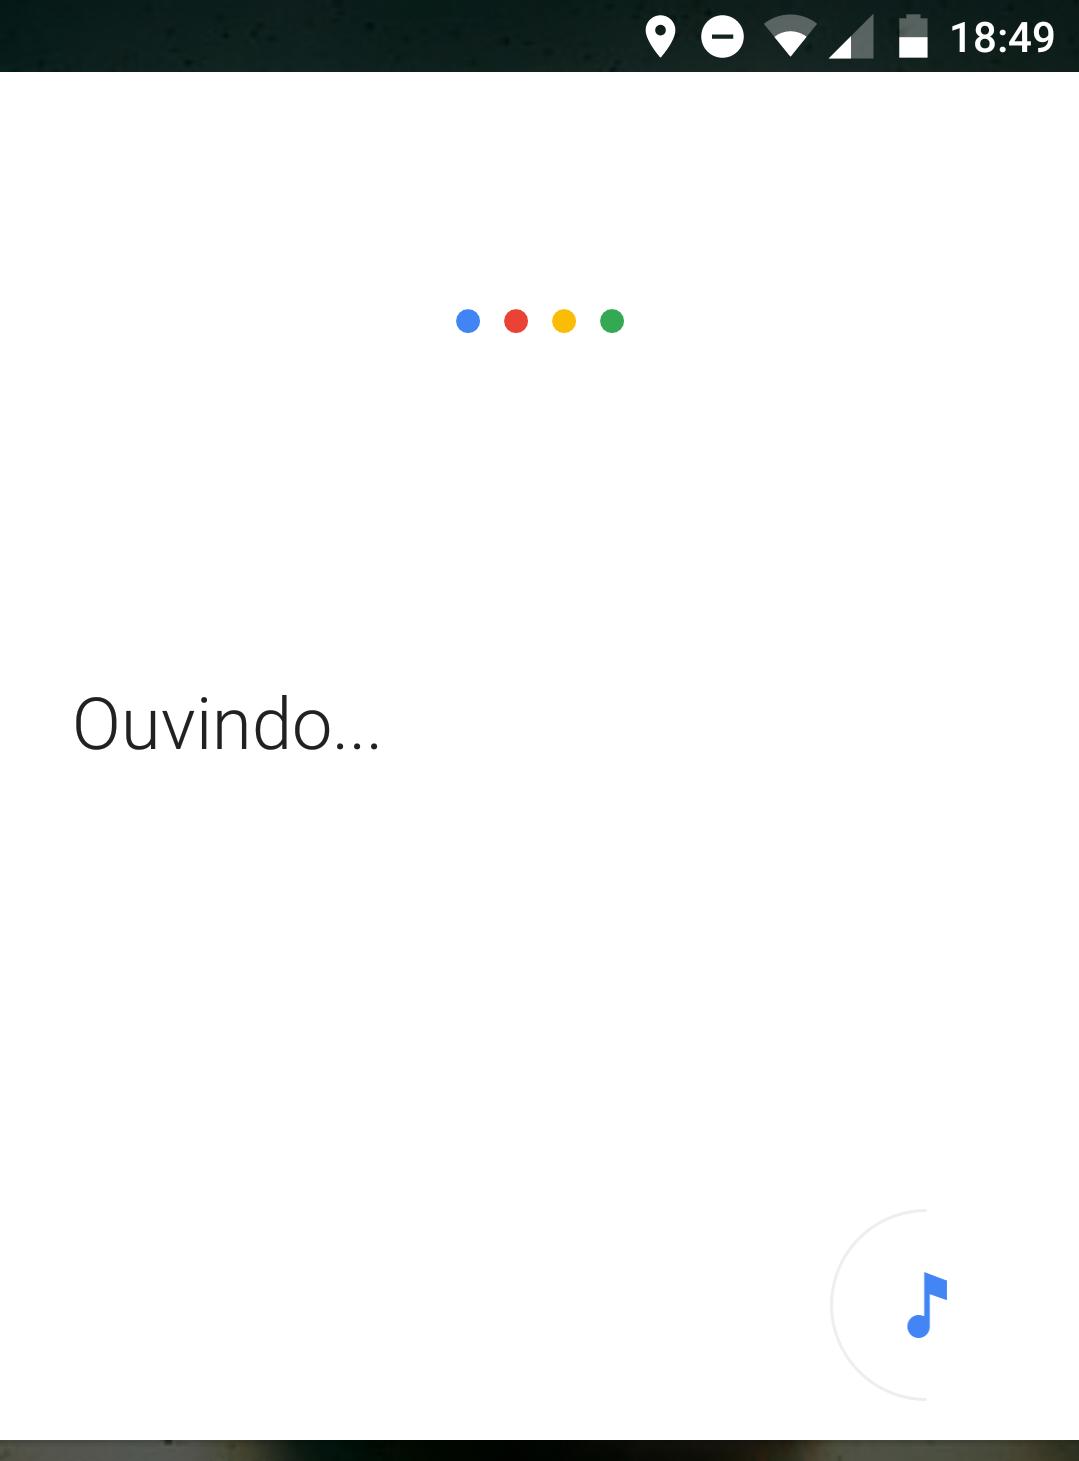 google-search-music